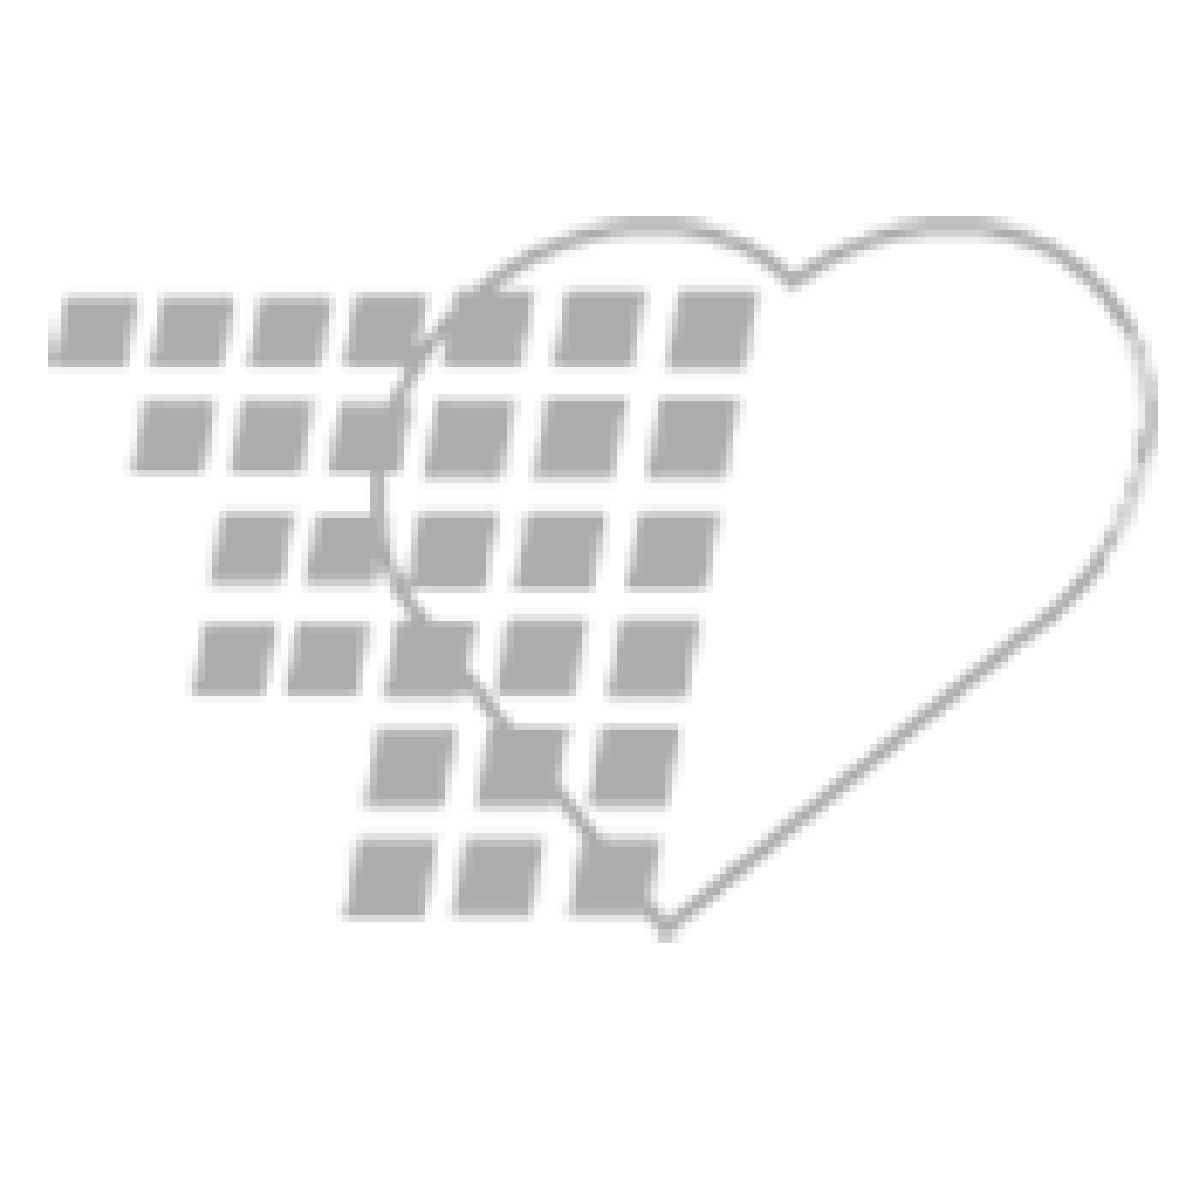 06-93-1153 Demo Dose® Sodim Bicrb 8.4% 50mL